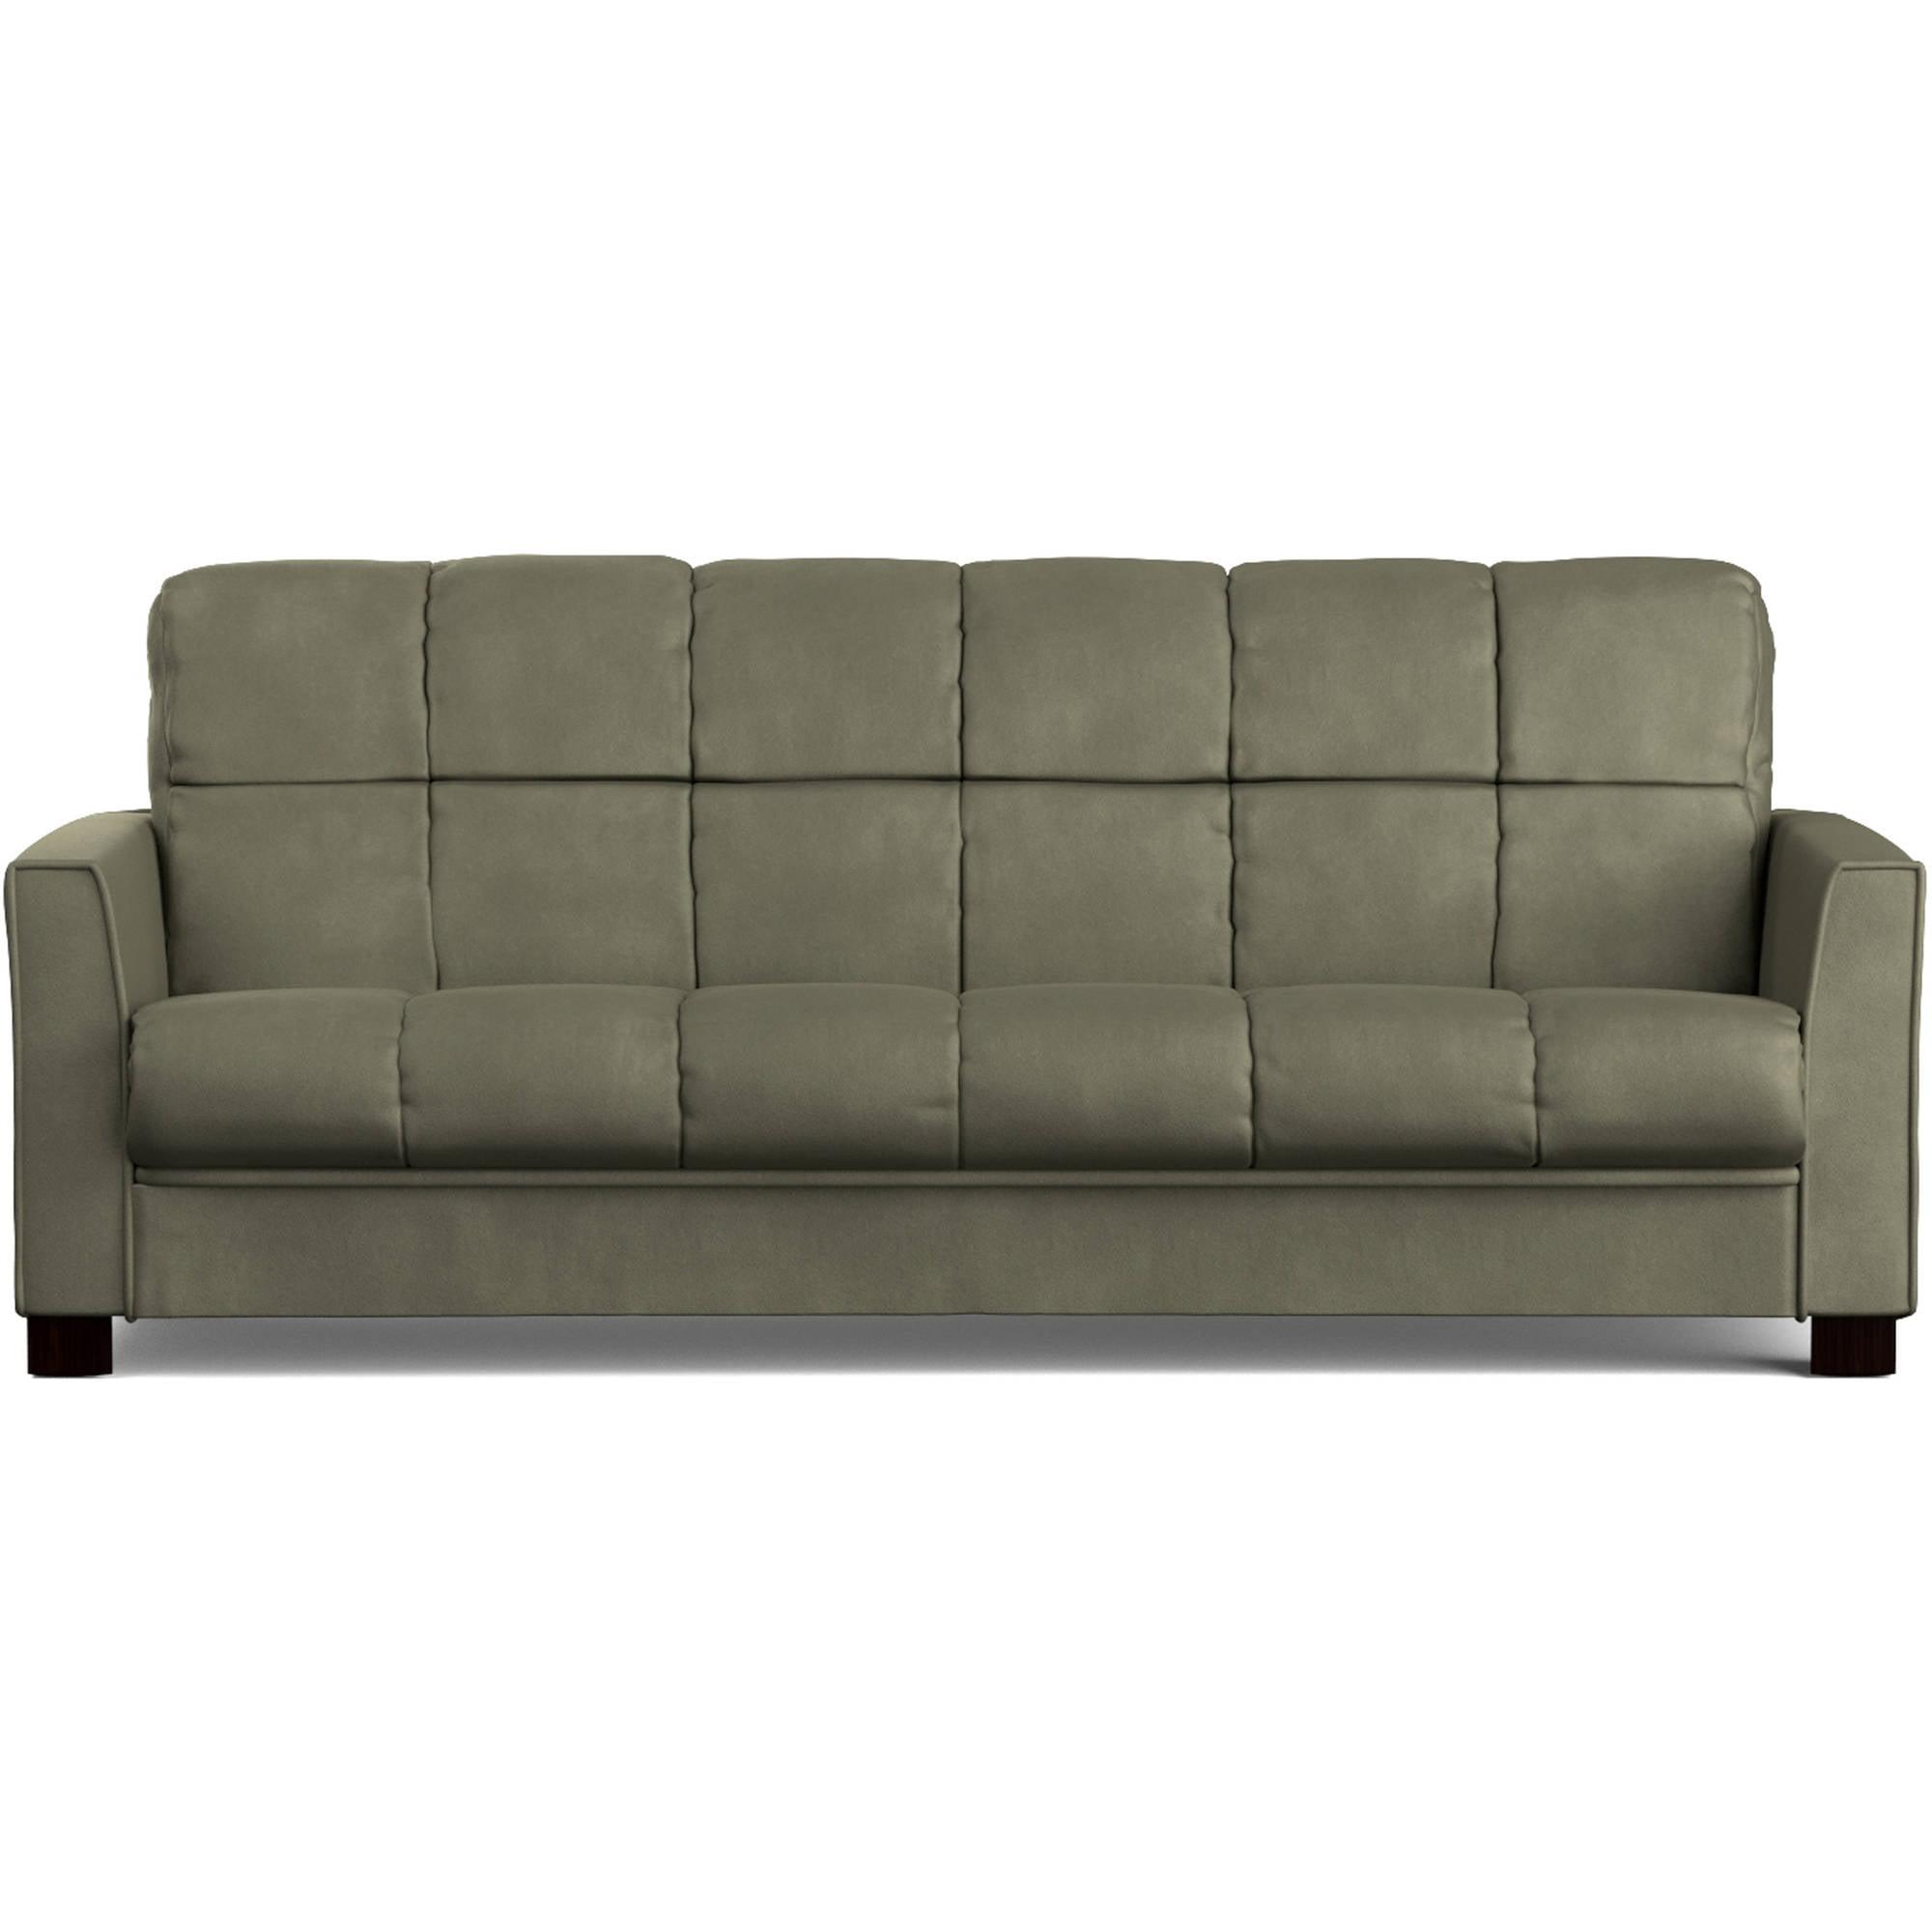 Mainstays Baja Futon Sofa Sleeper Bed, Multiple Colors picture